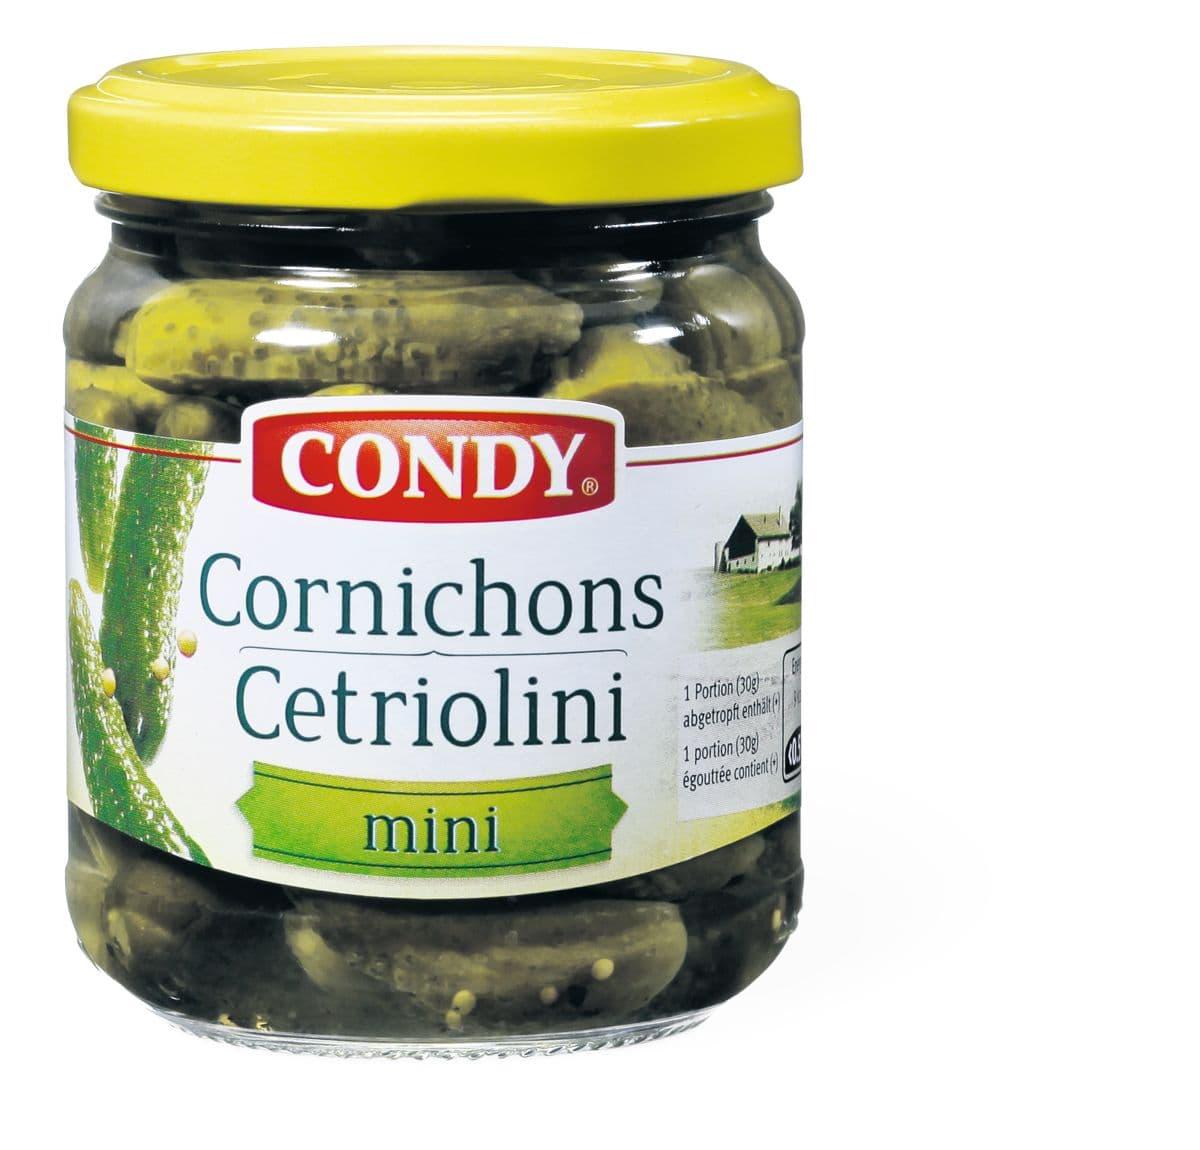 Condy Cornichons fein